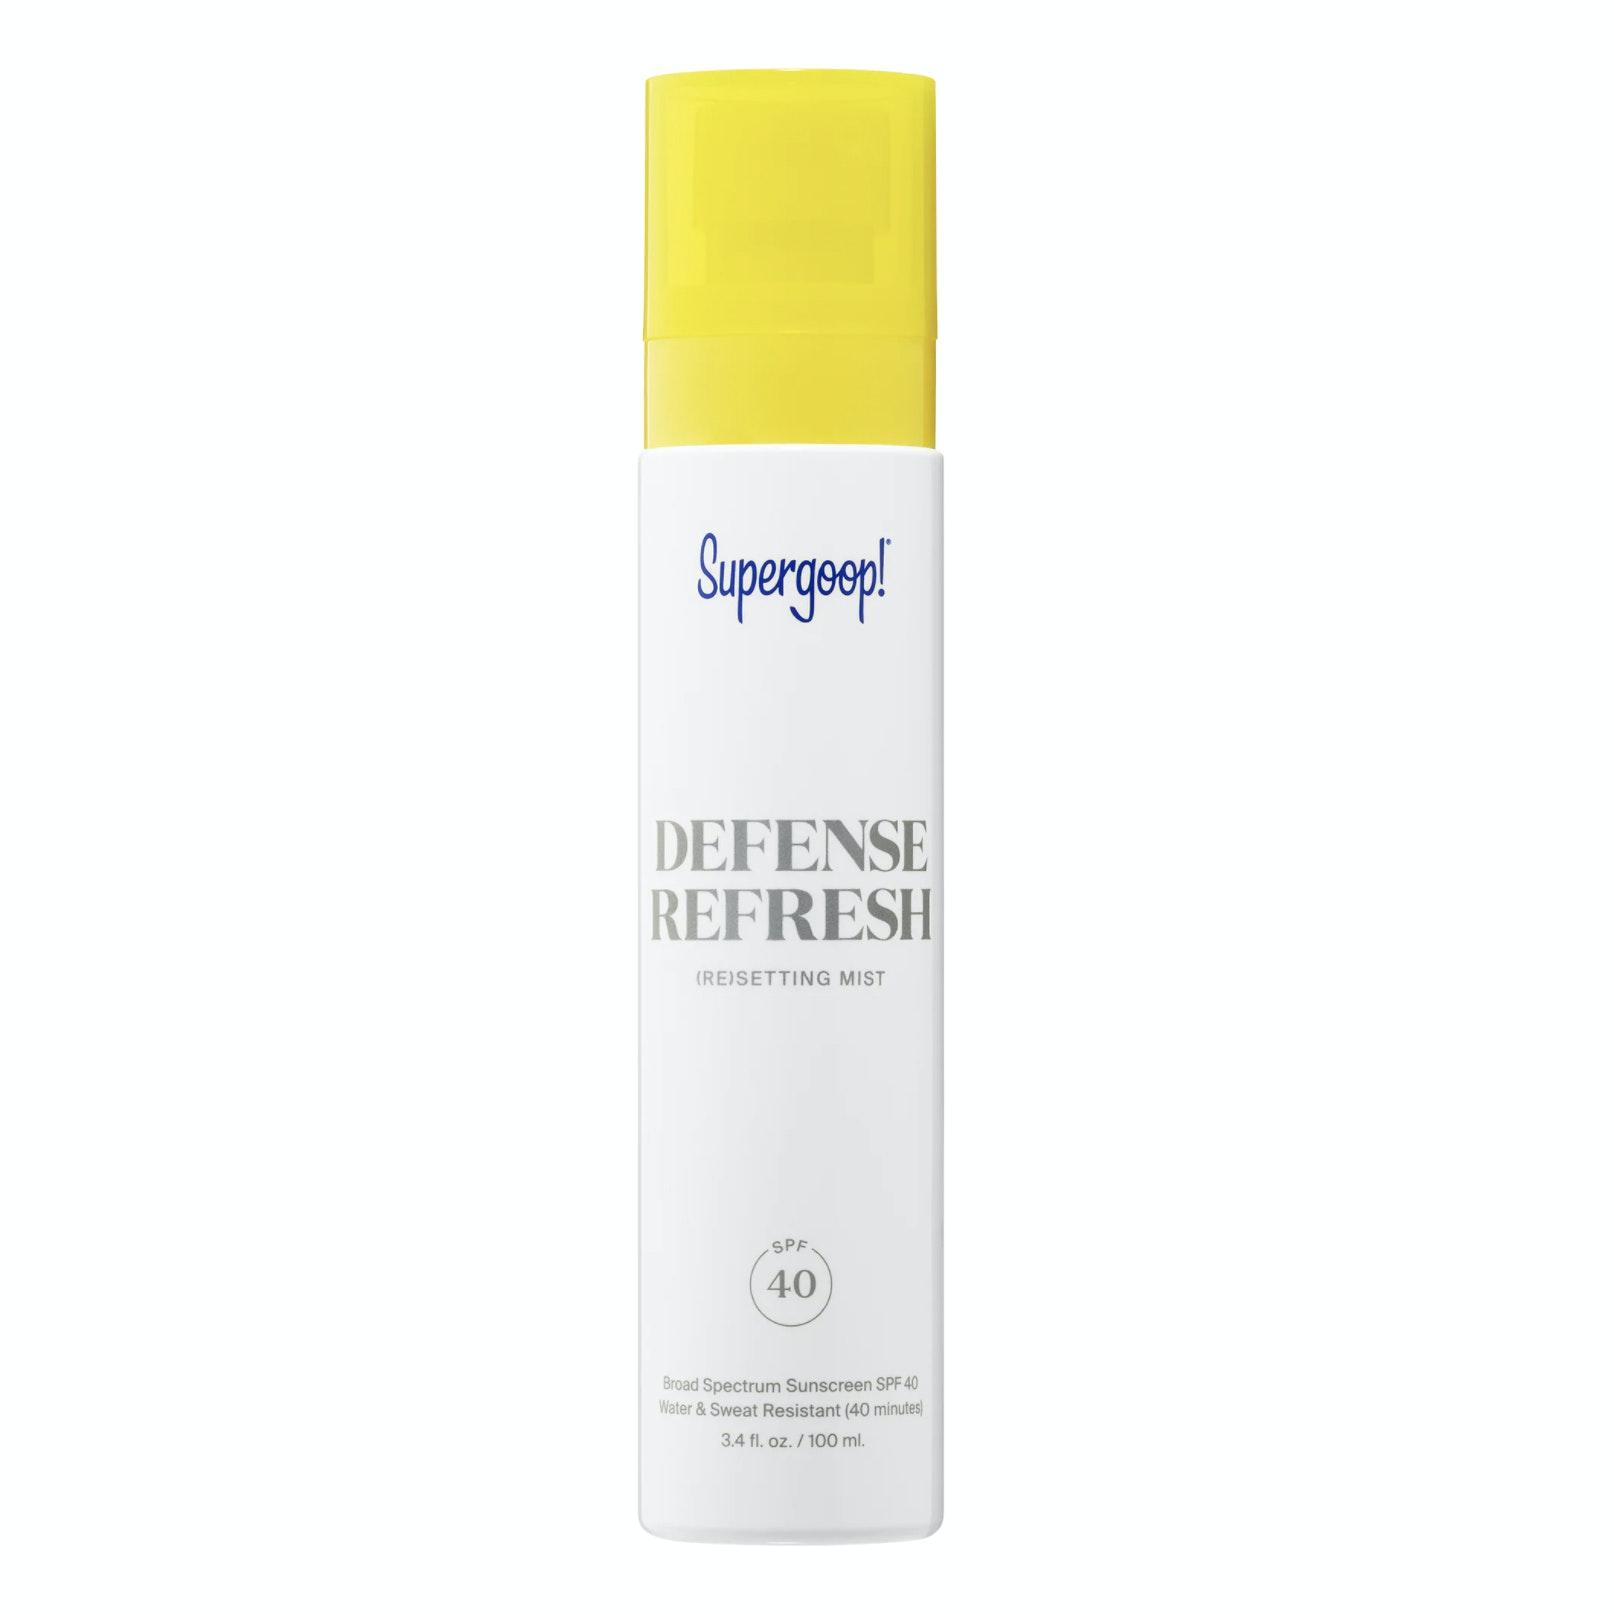 Supergoop!® Defense Refresh (Re)setting Mist SPF 40